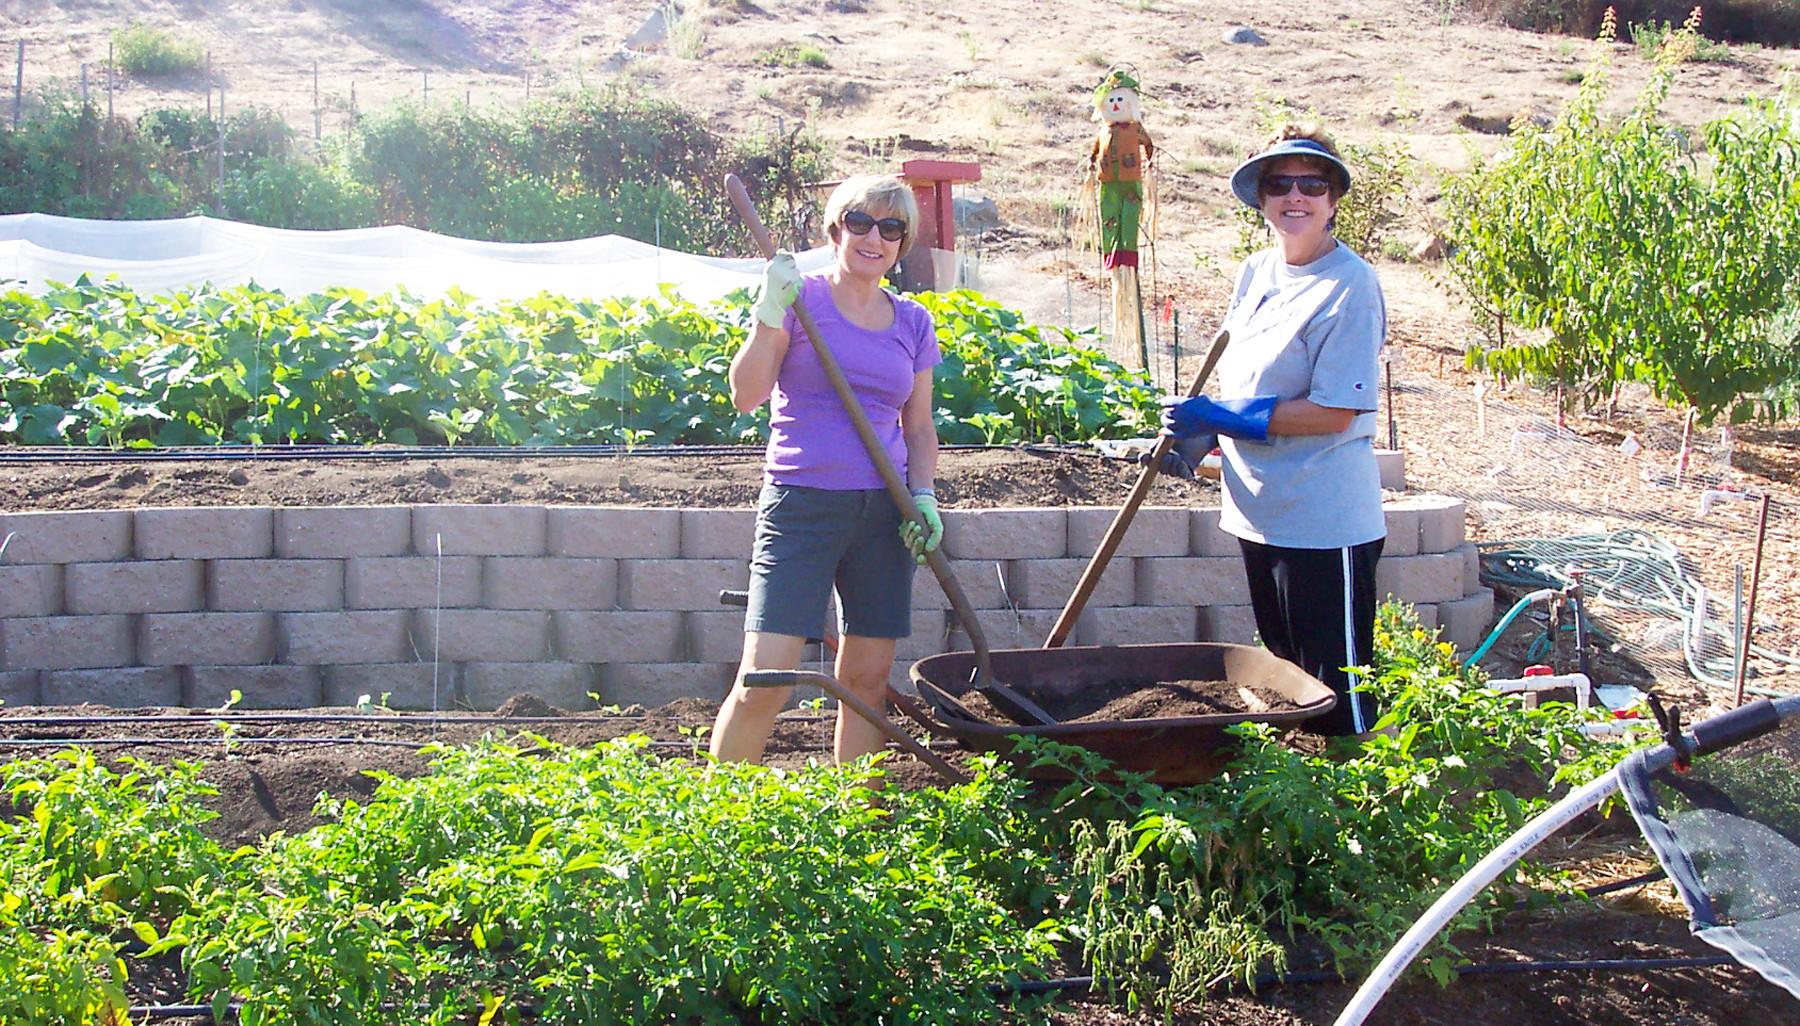 backyard produce project reaches 100 ton mark pomerado news